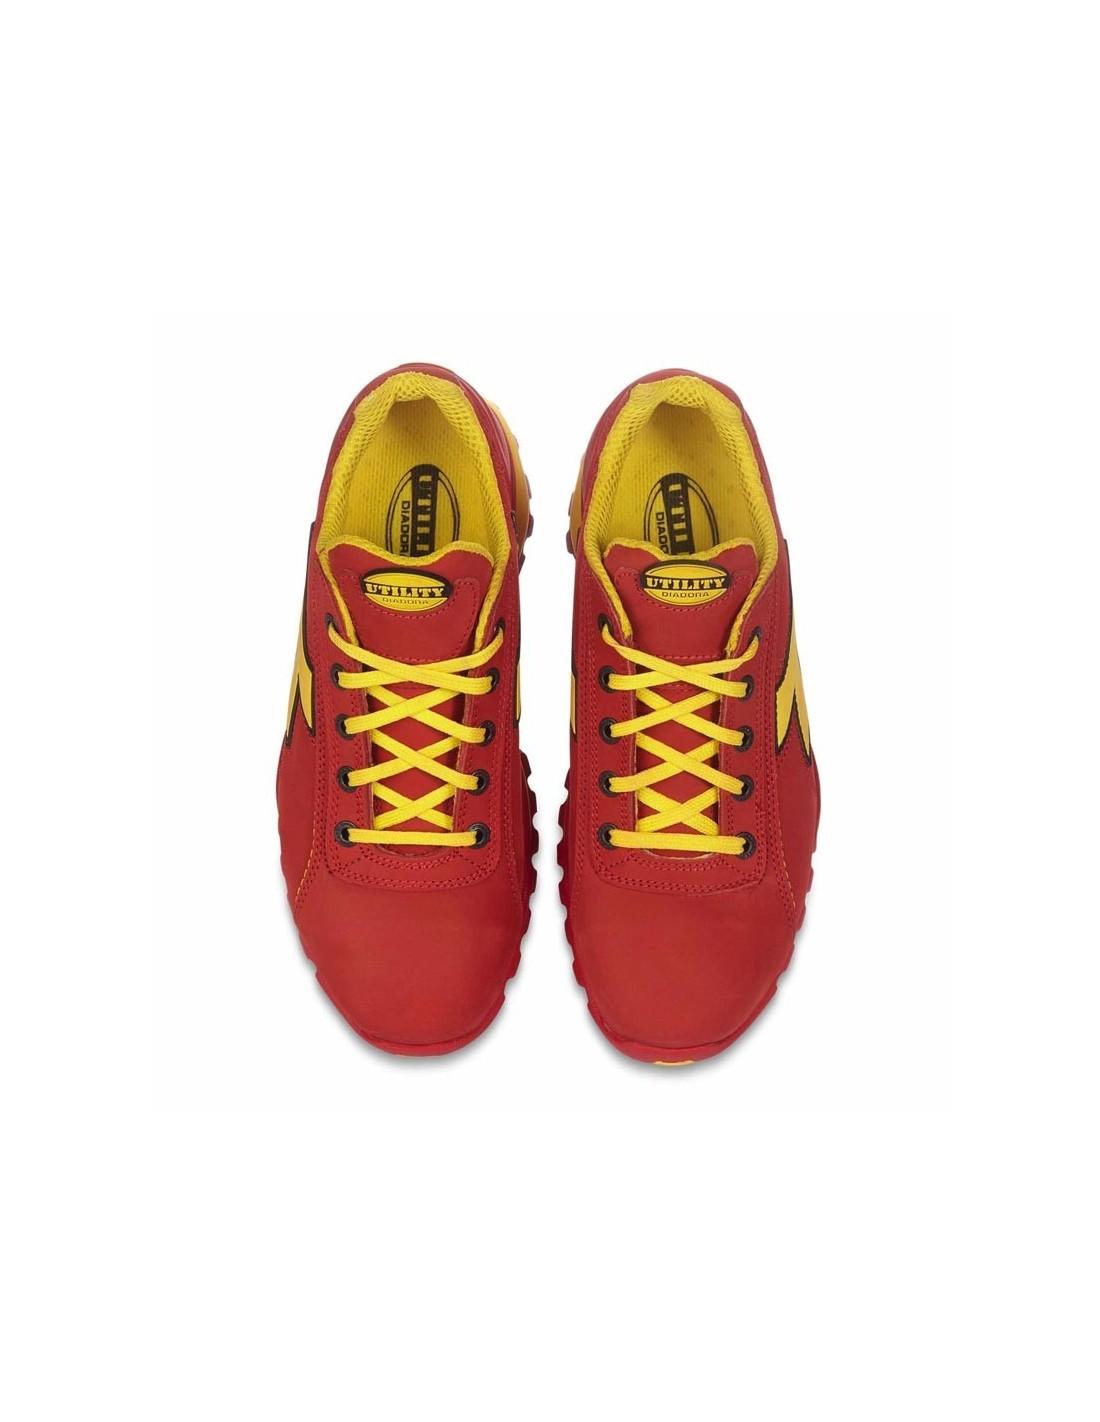 Acquistare scarpe diadora glove Economici  OFF65% scontate 747ba6556d6